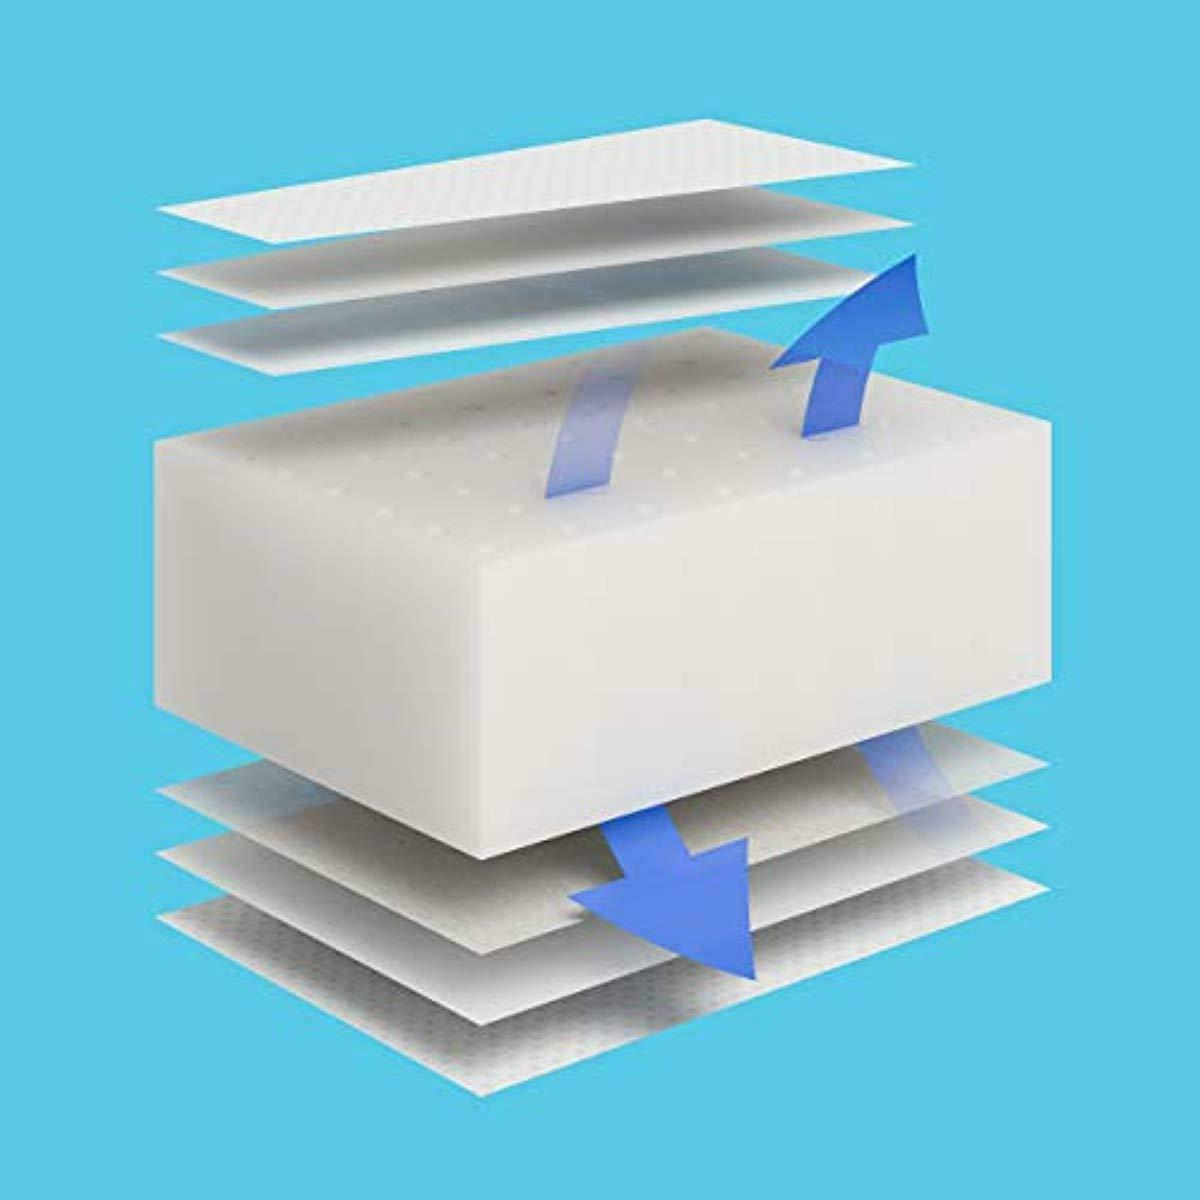 Premium Foam Bed Mattress Removable